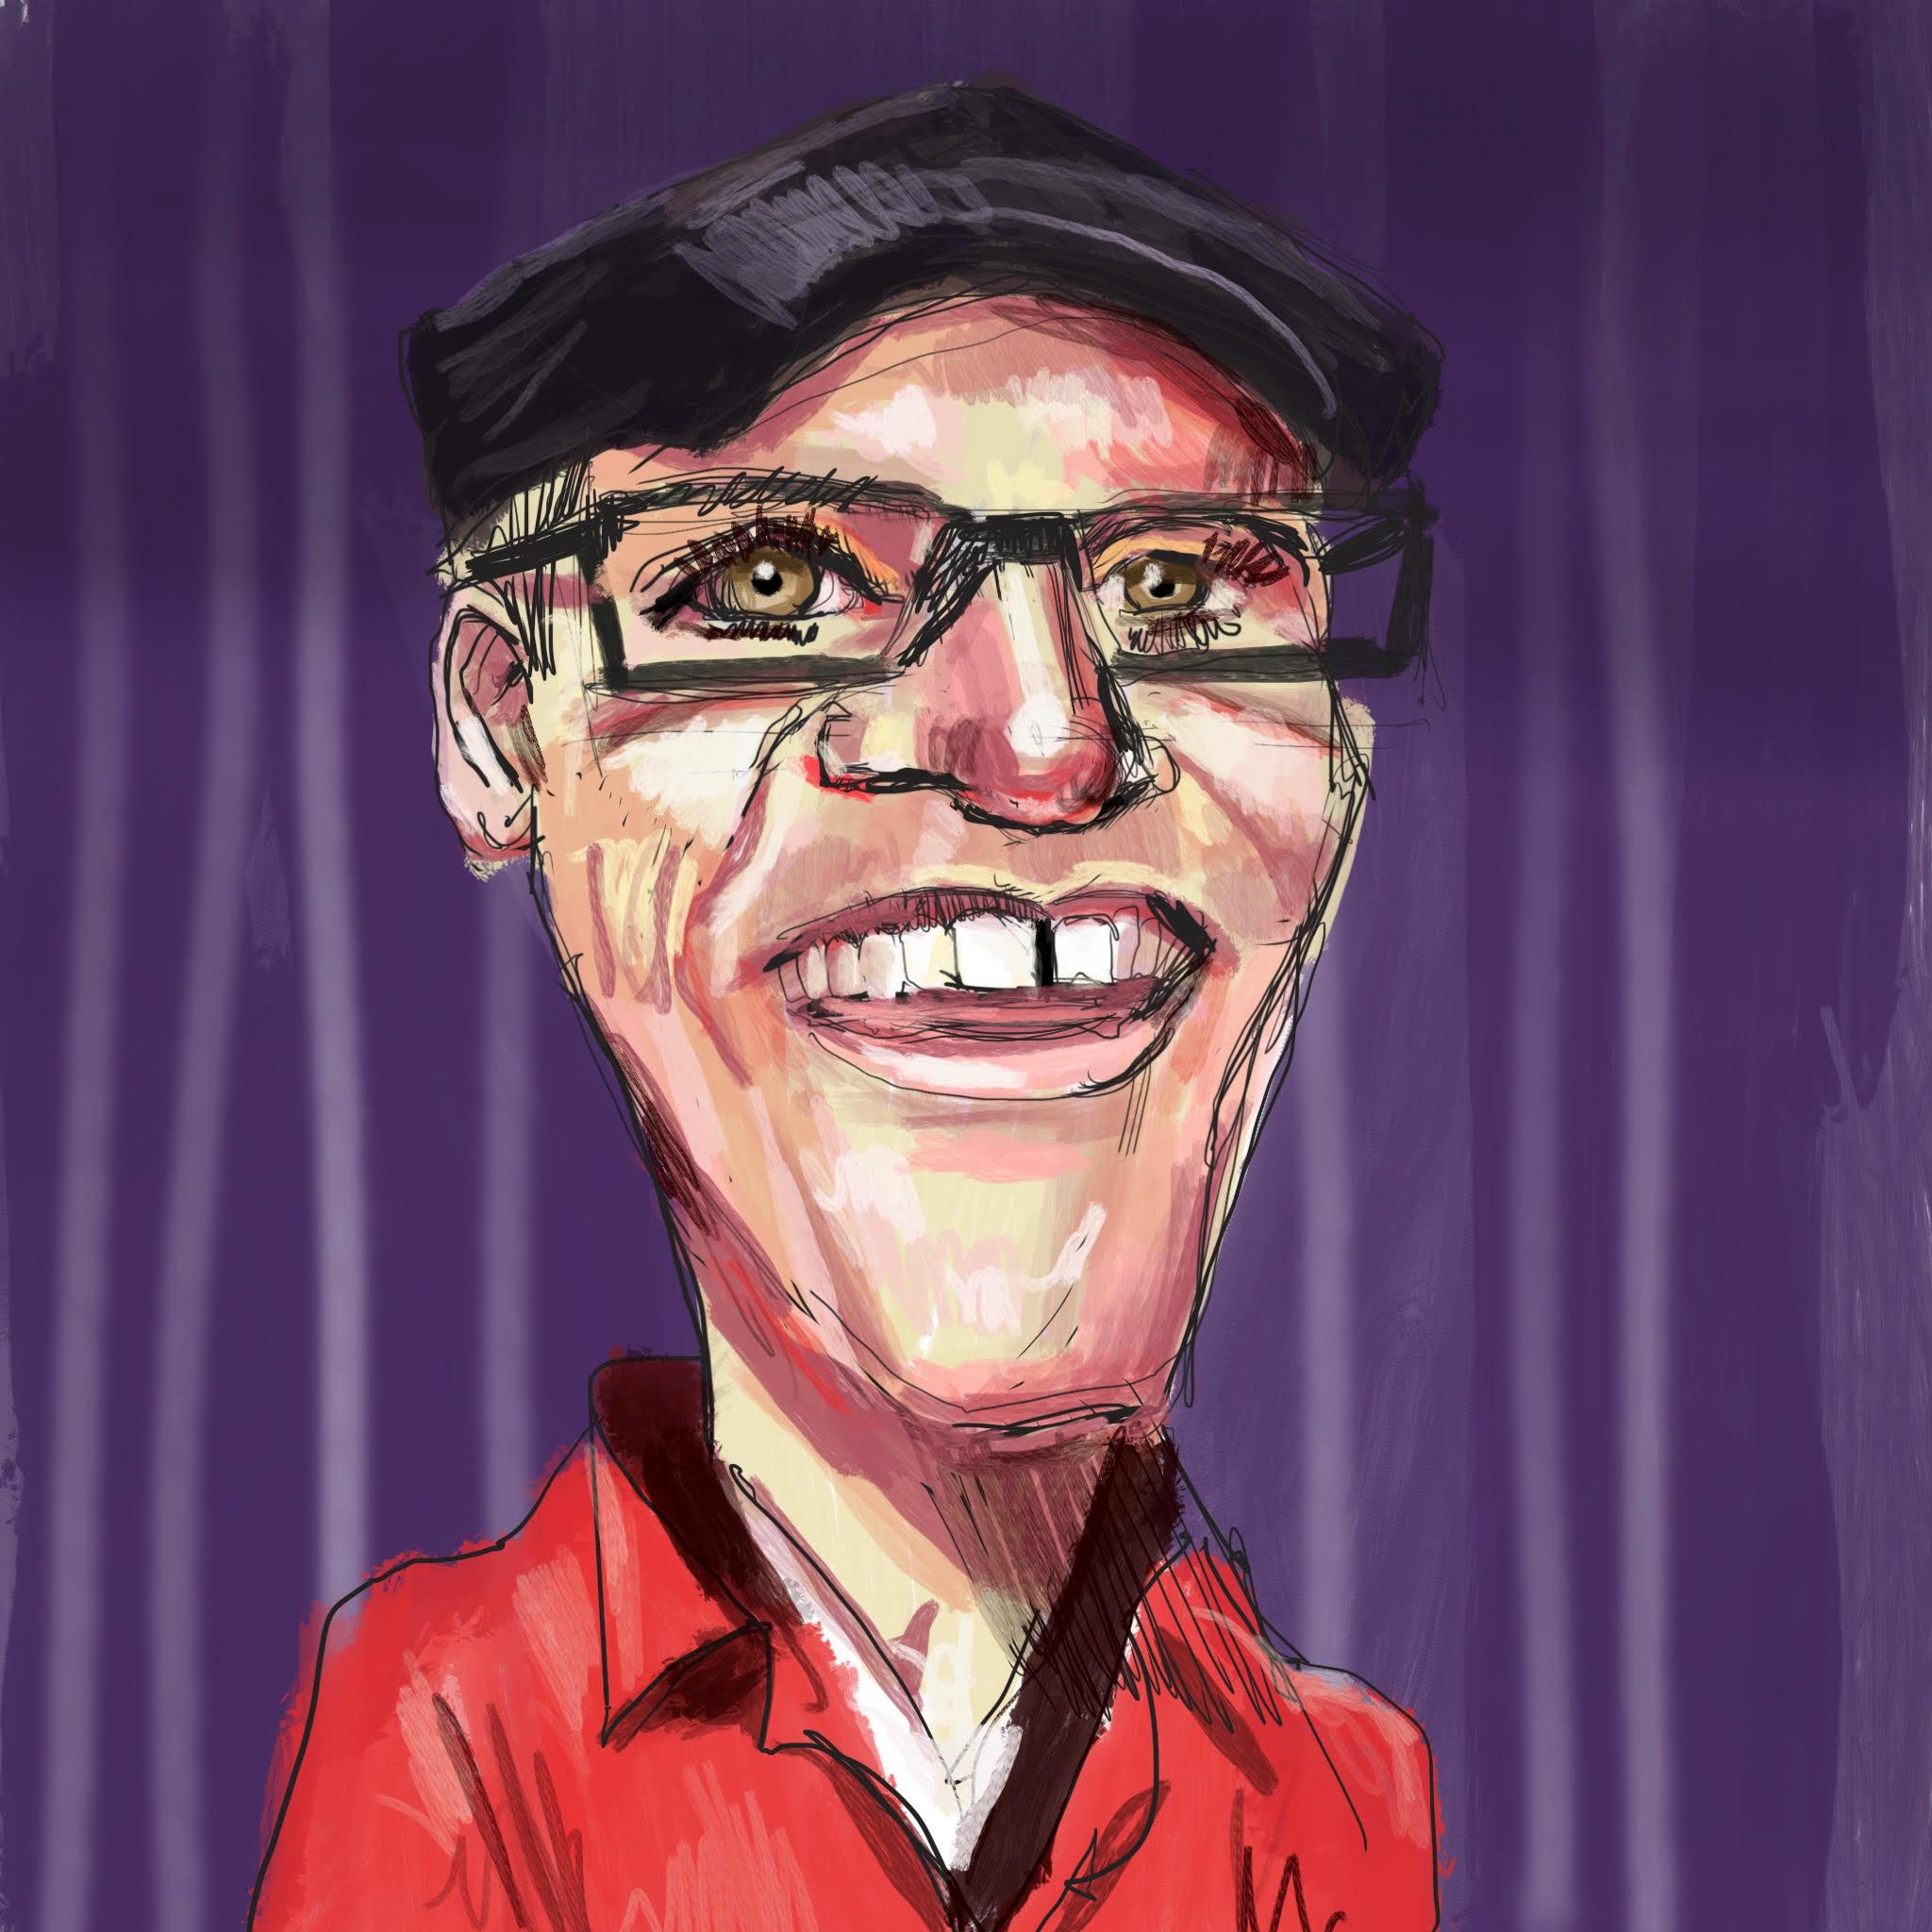 Greg Fitzsimmons caricature